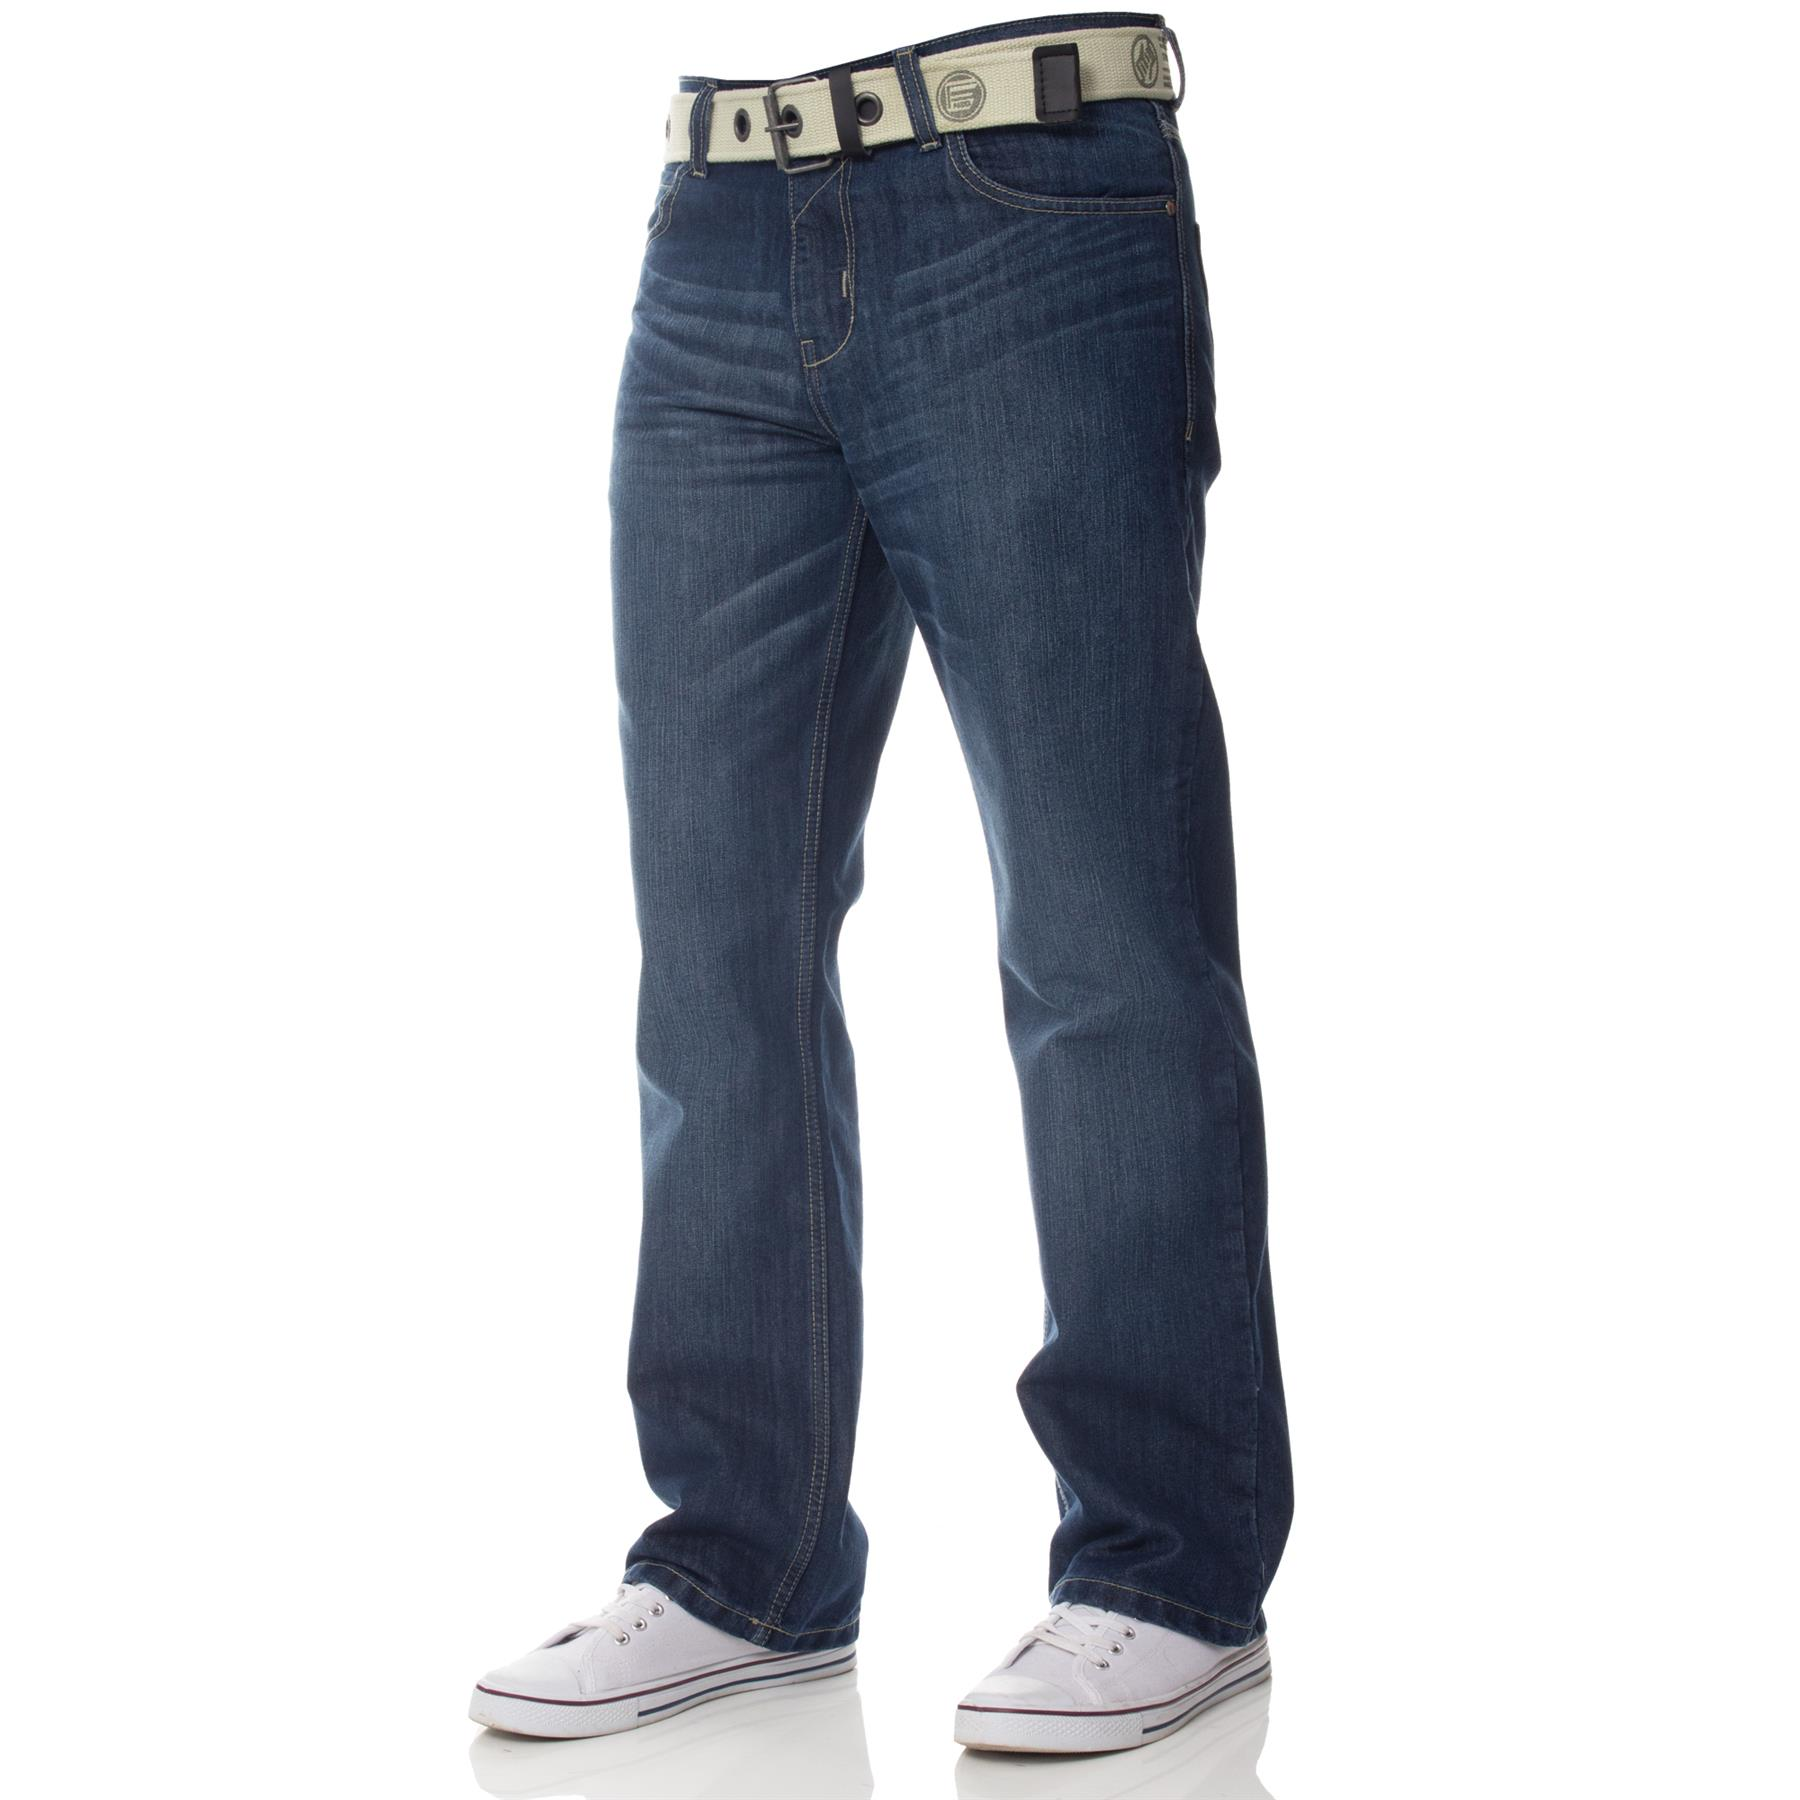 Enzo-Mens-Big-Tall-Jeans-Leg-King-Size-Denim-Pants-Chino-Trousers-Pants-44-034-60-034 thumbnail 46